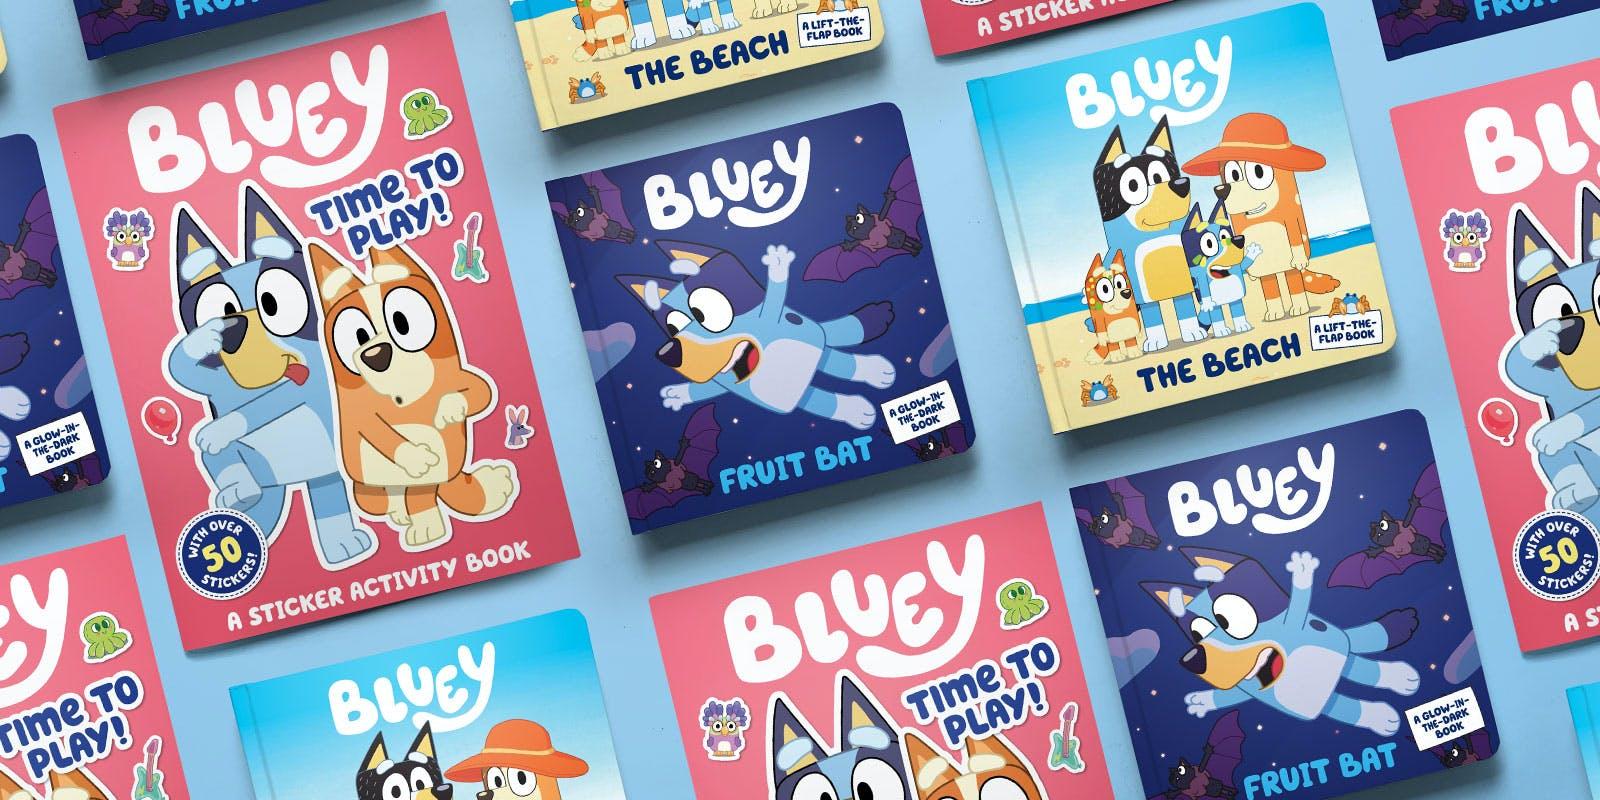 Bluey books arrive November